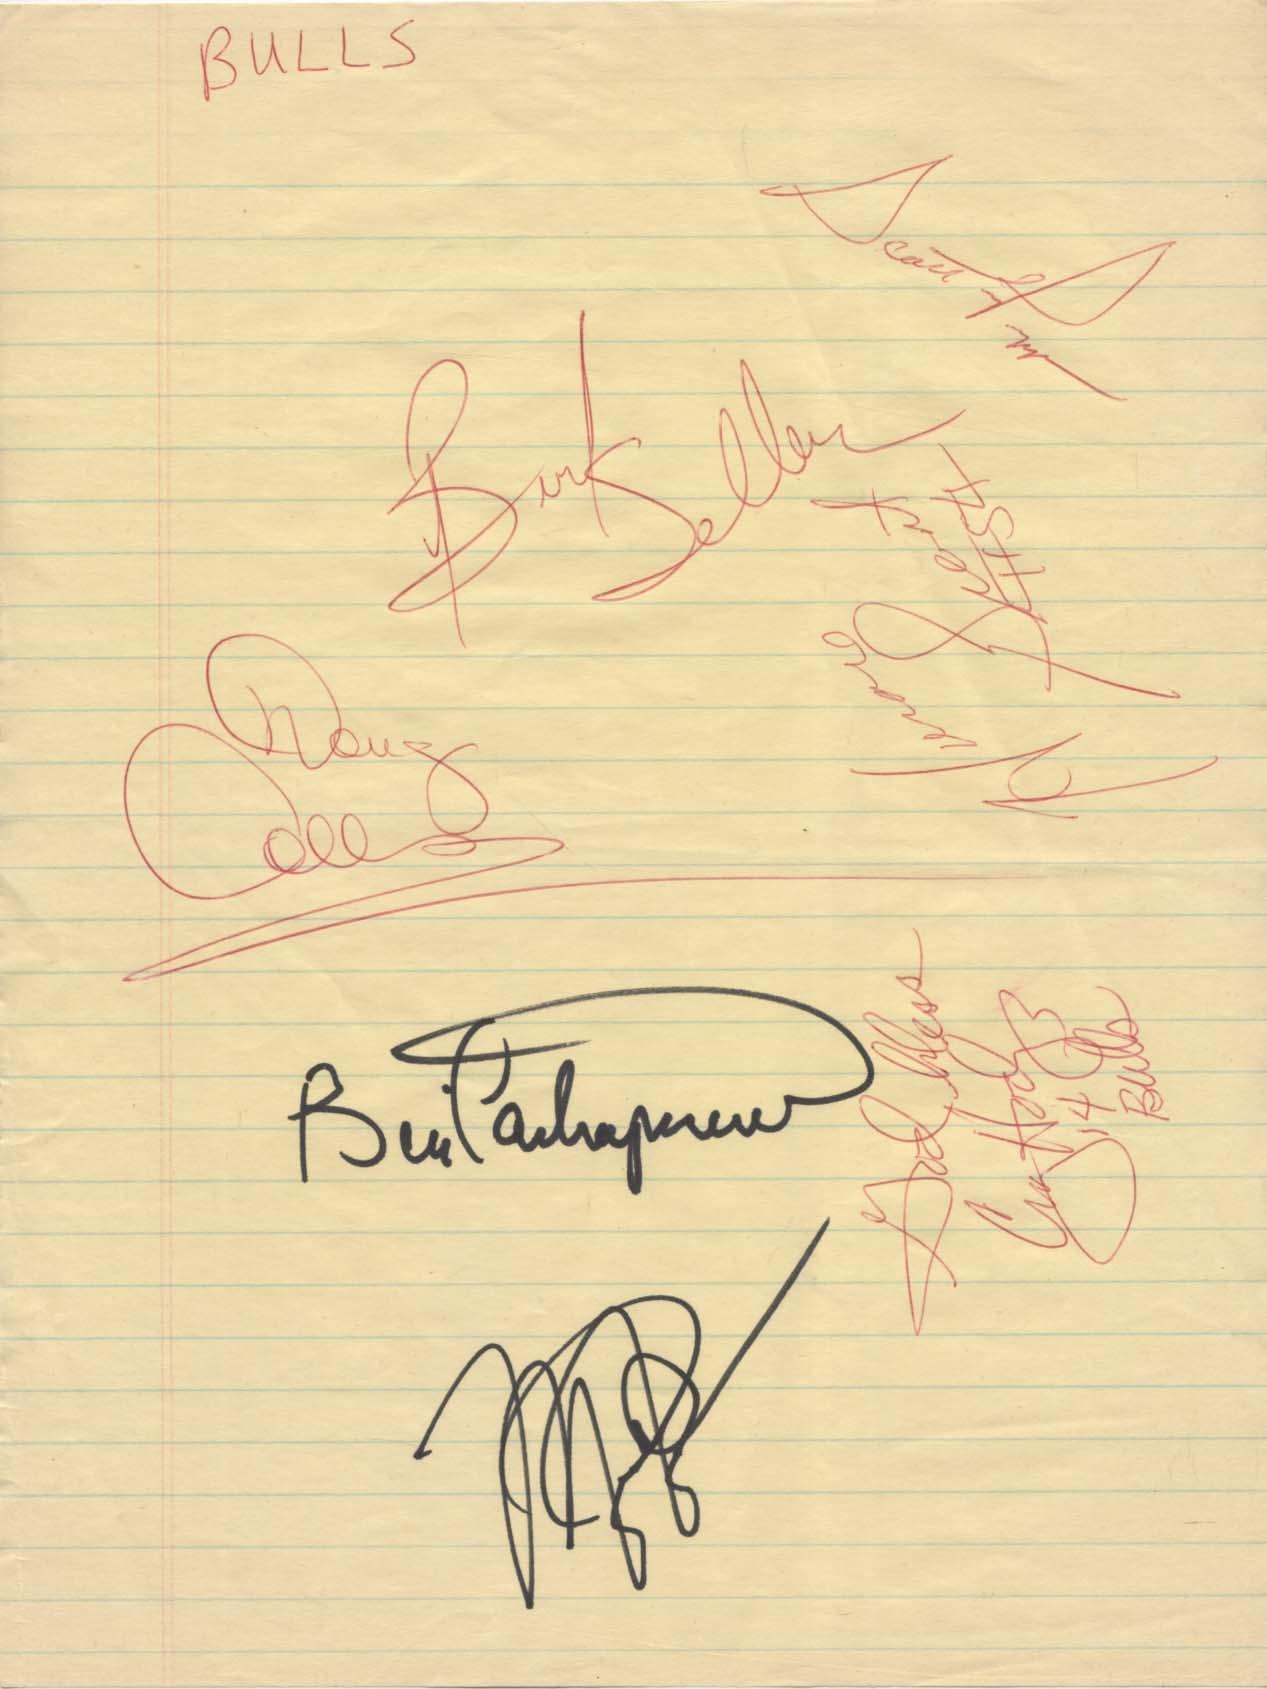 Lot #940  Team Sheet  1988/89 Bulls w/Jordan & Pippin Cond: 9